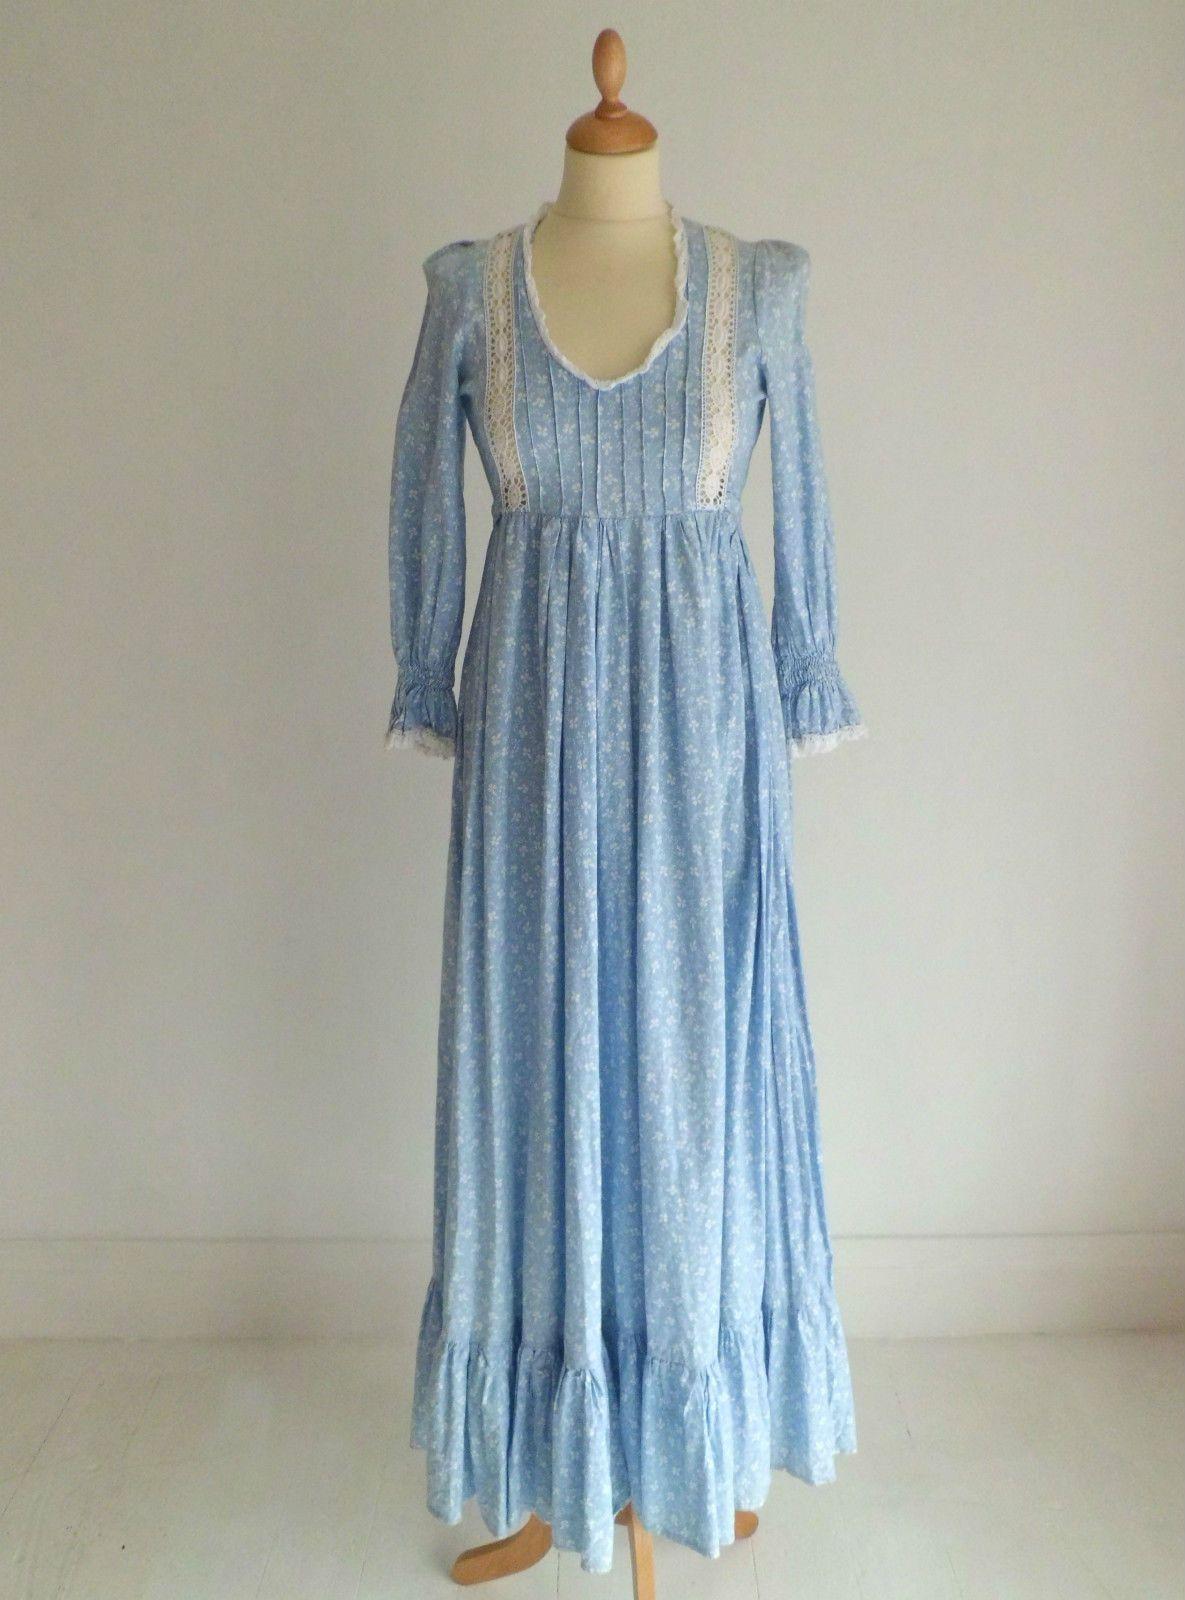 9afac6653 Vintage late 1960s Laura Ashley pale pastel blue & white floral maxi long  dress | eBay